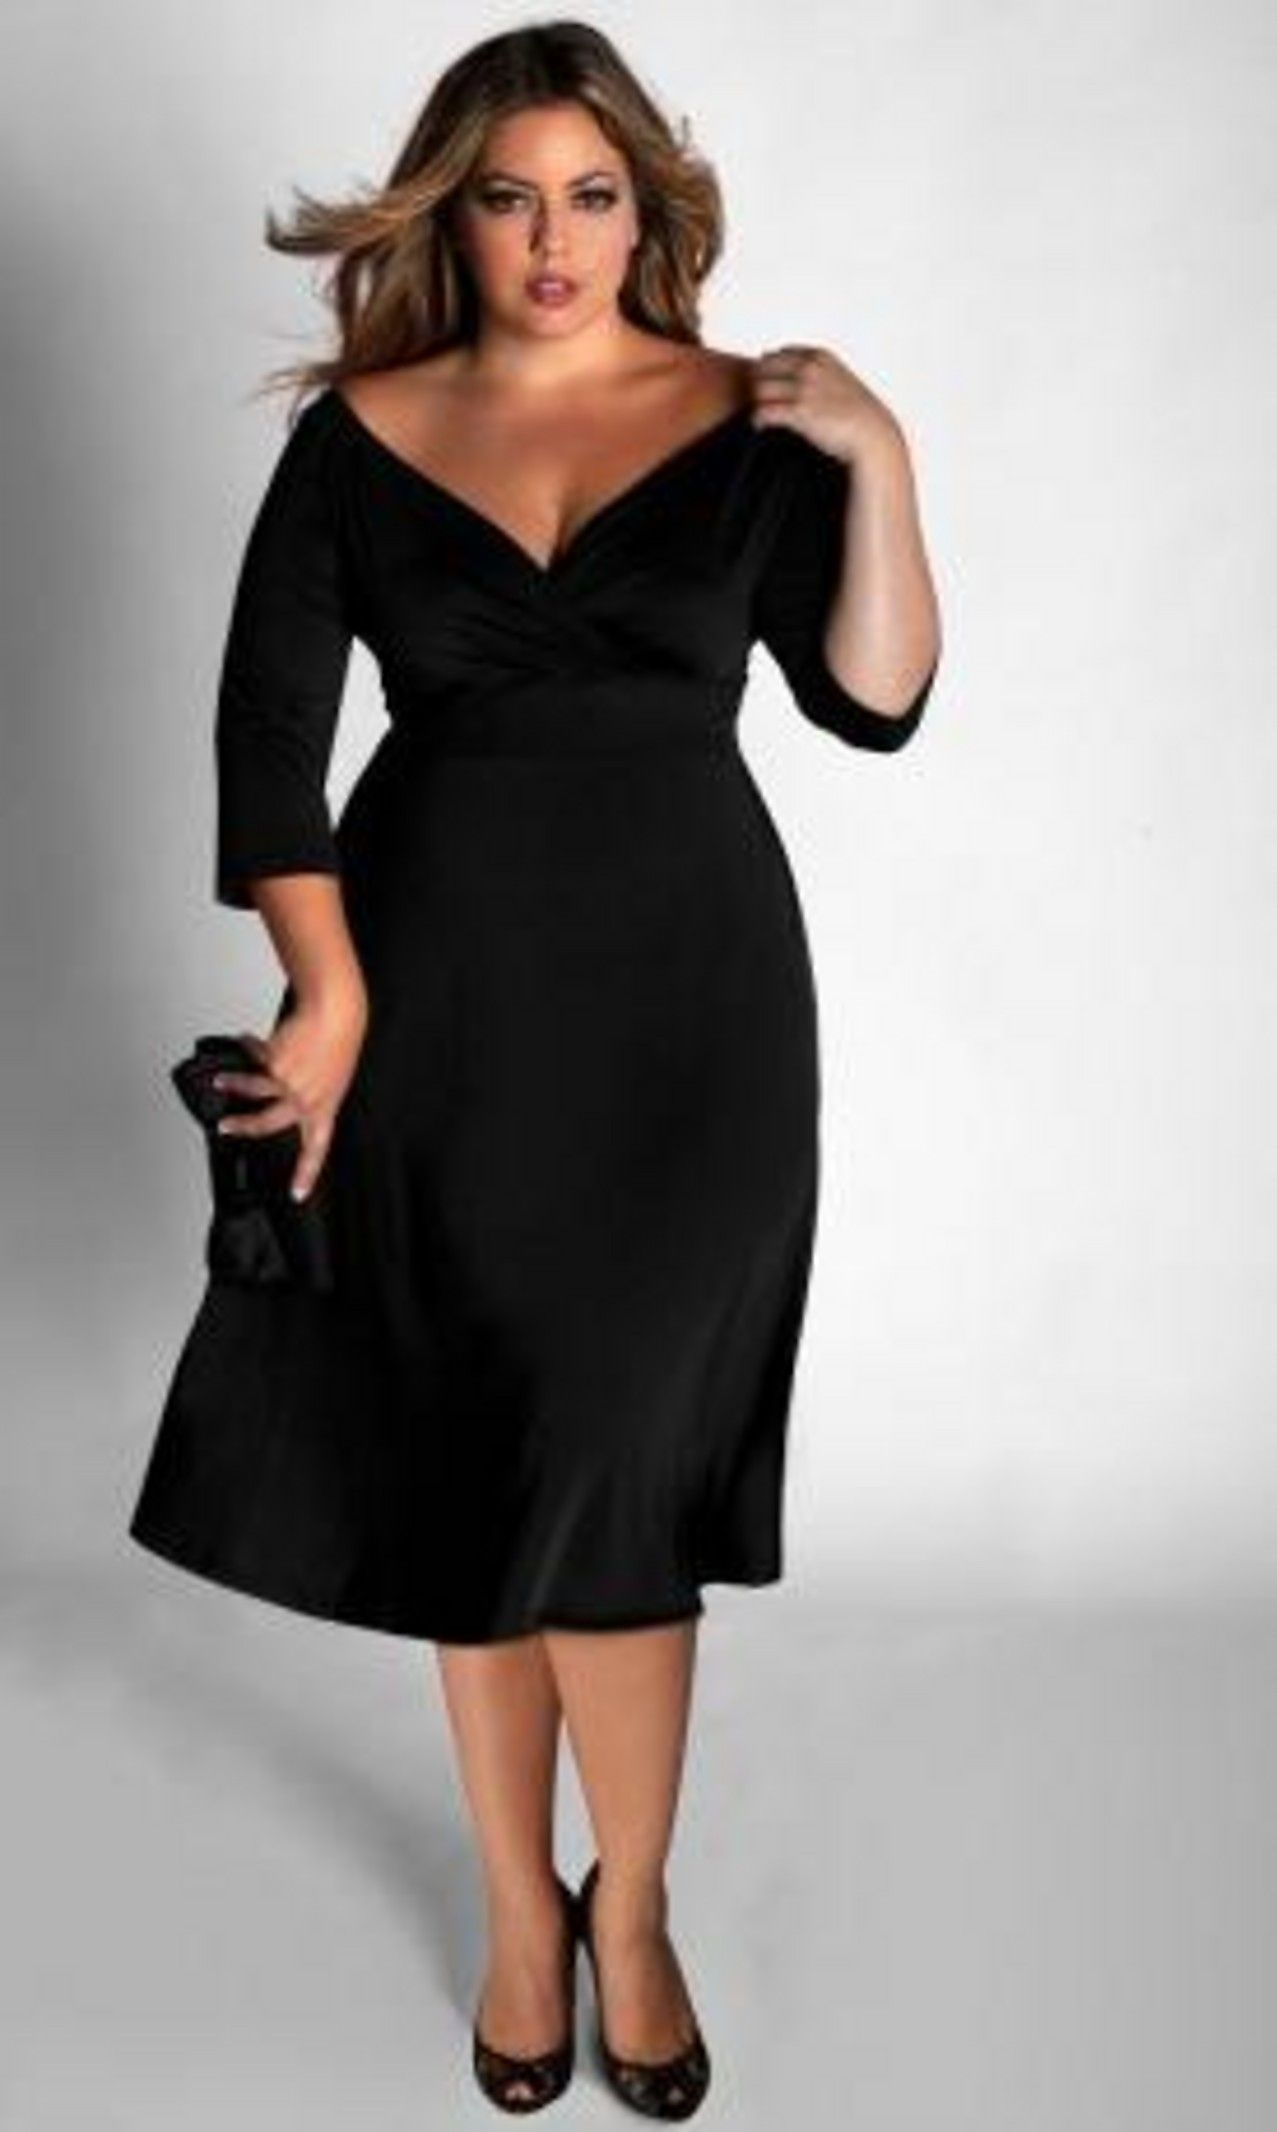 Plus Size Formal Prom Dresses Evening Gowns Simply Dresses Plus Size Cocktail Dresses Plus Size Dresses Size Fashion [ 2132 x 1277 Pixel ]